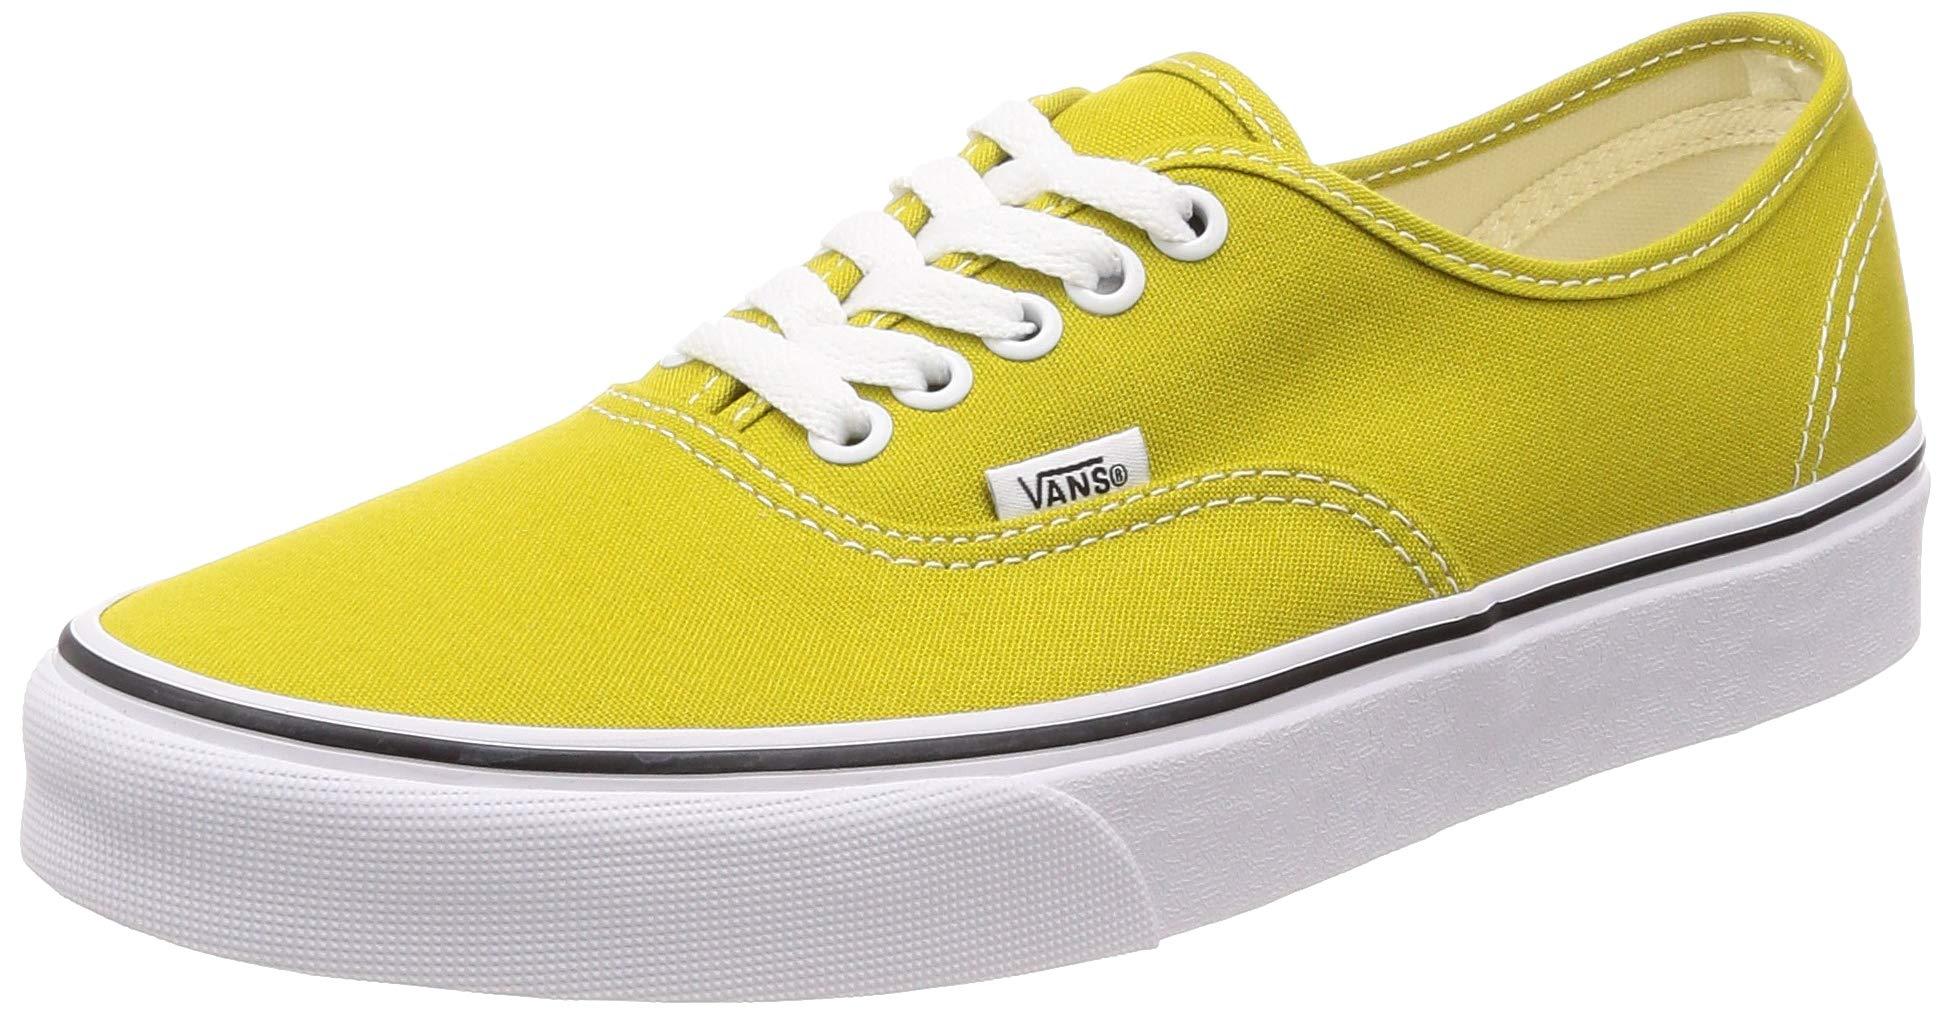 52da363e091 Galleon - Vans Authentic Youth 5.5 Womens 7 Cress Green True White Skate  Shoes